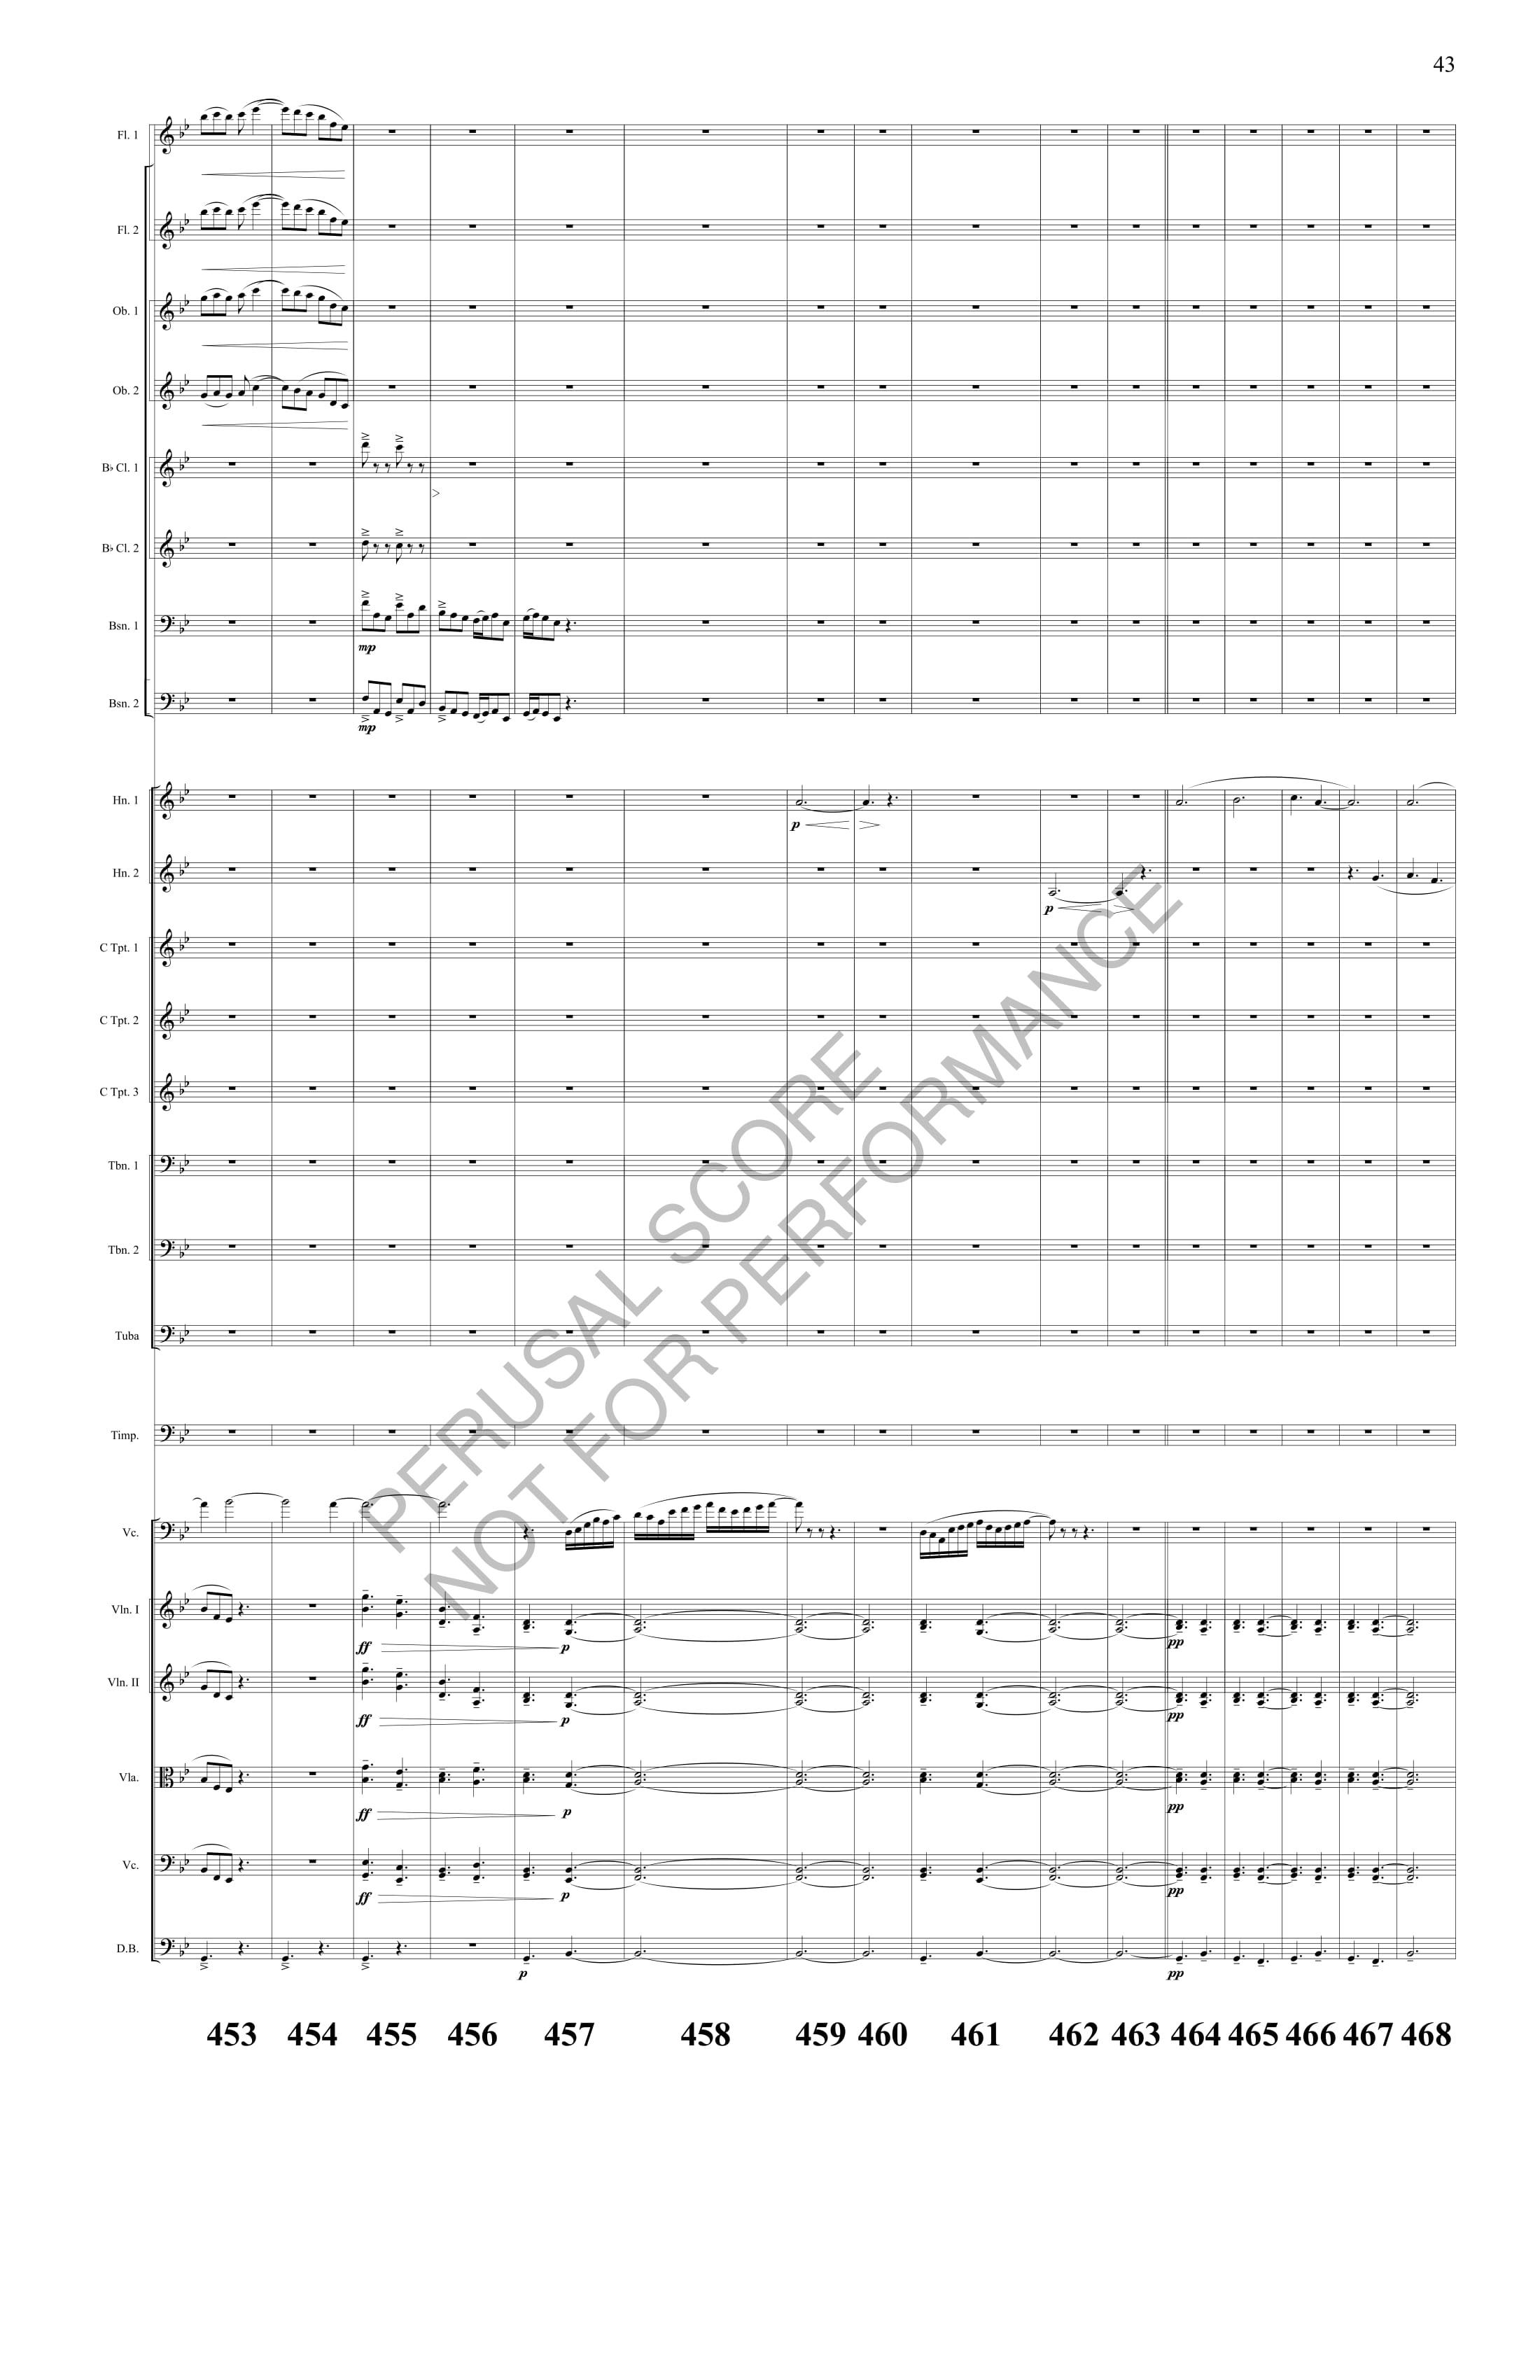 Boyd Tekton Score-watermark-49.jpg